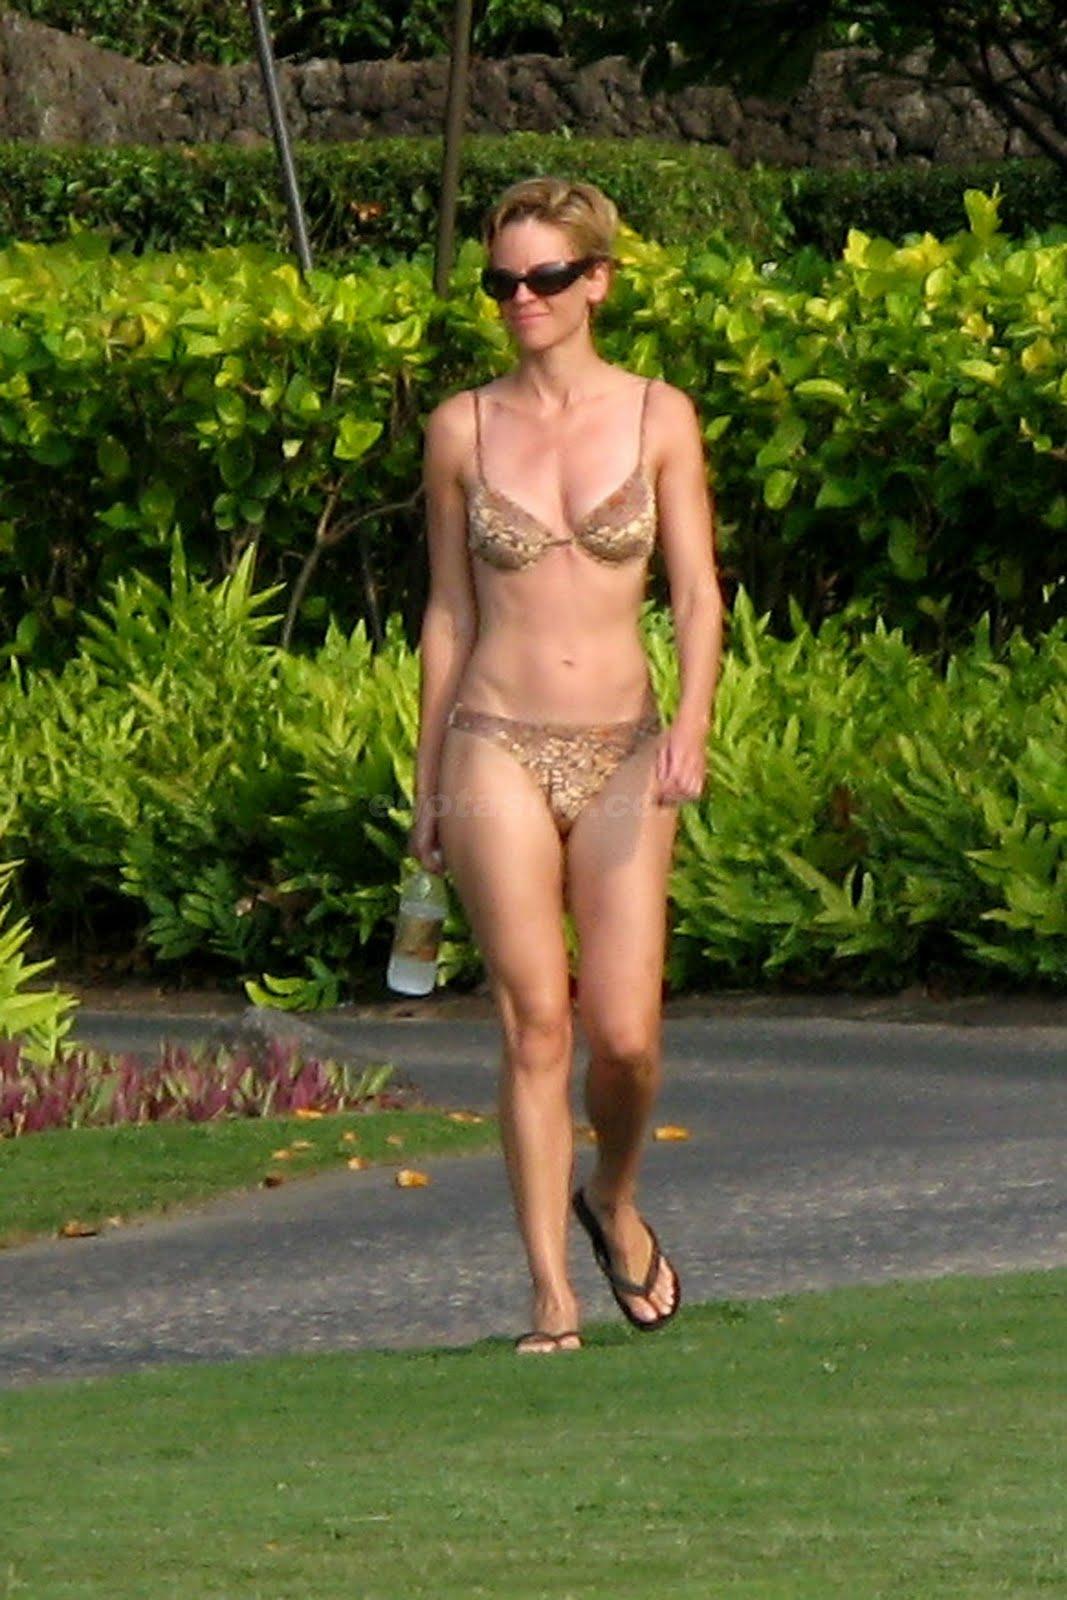 http://3.bp.blogspot.com/_3G4dg-GWVKI/TJNM3SeYGhI/AAAAAAAAH_w/xyDj_mquuQE/s1600/11152_hilary-swank-bikini-1-06_123_341lo.jpg